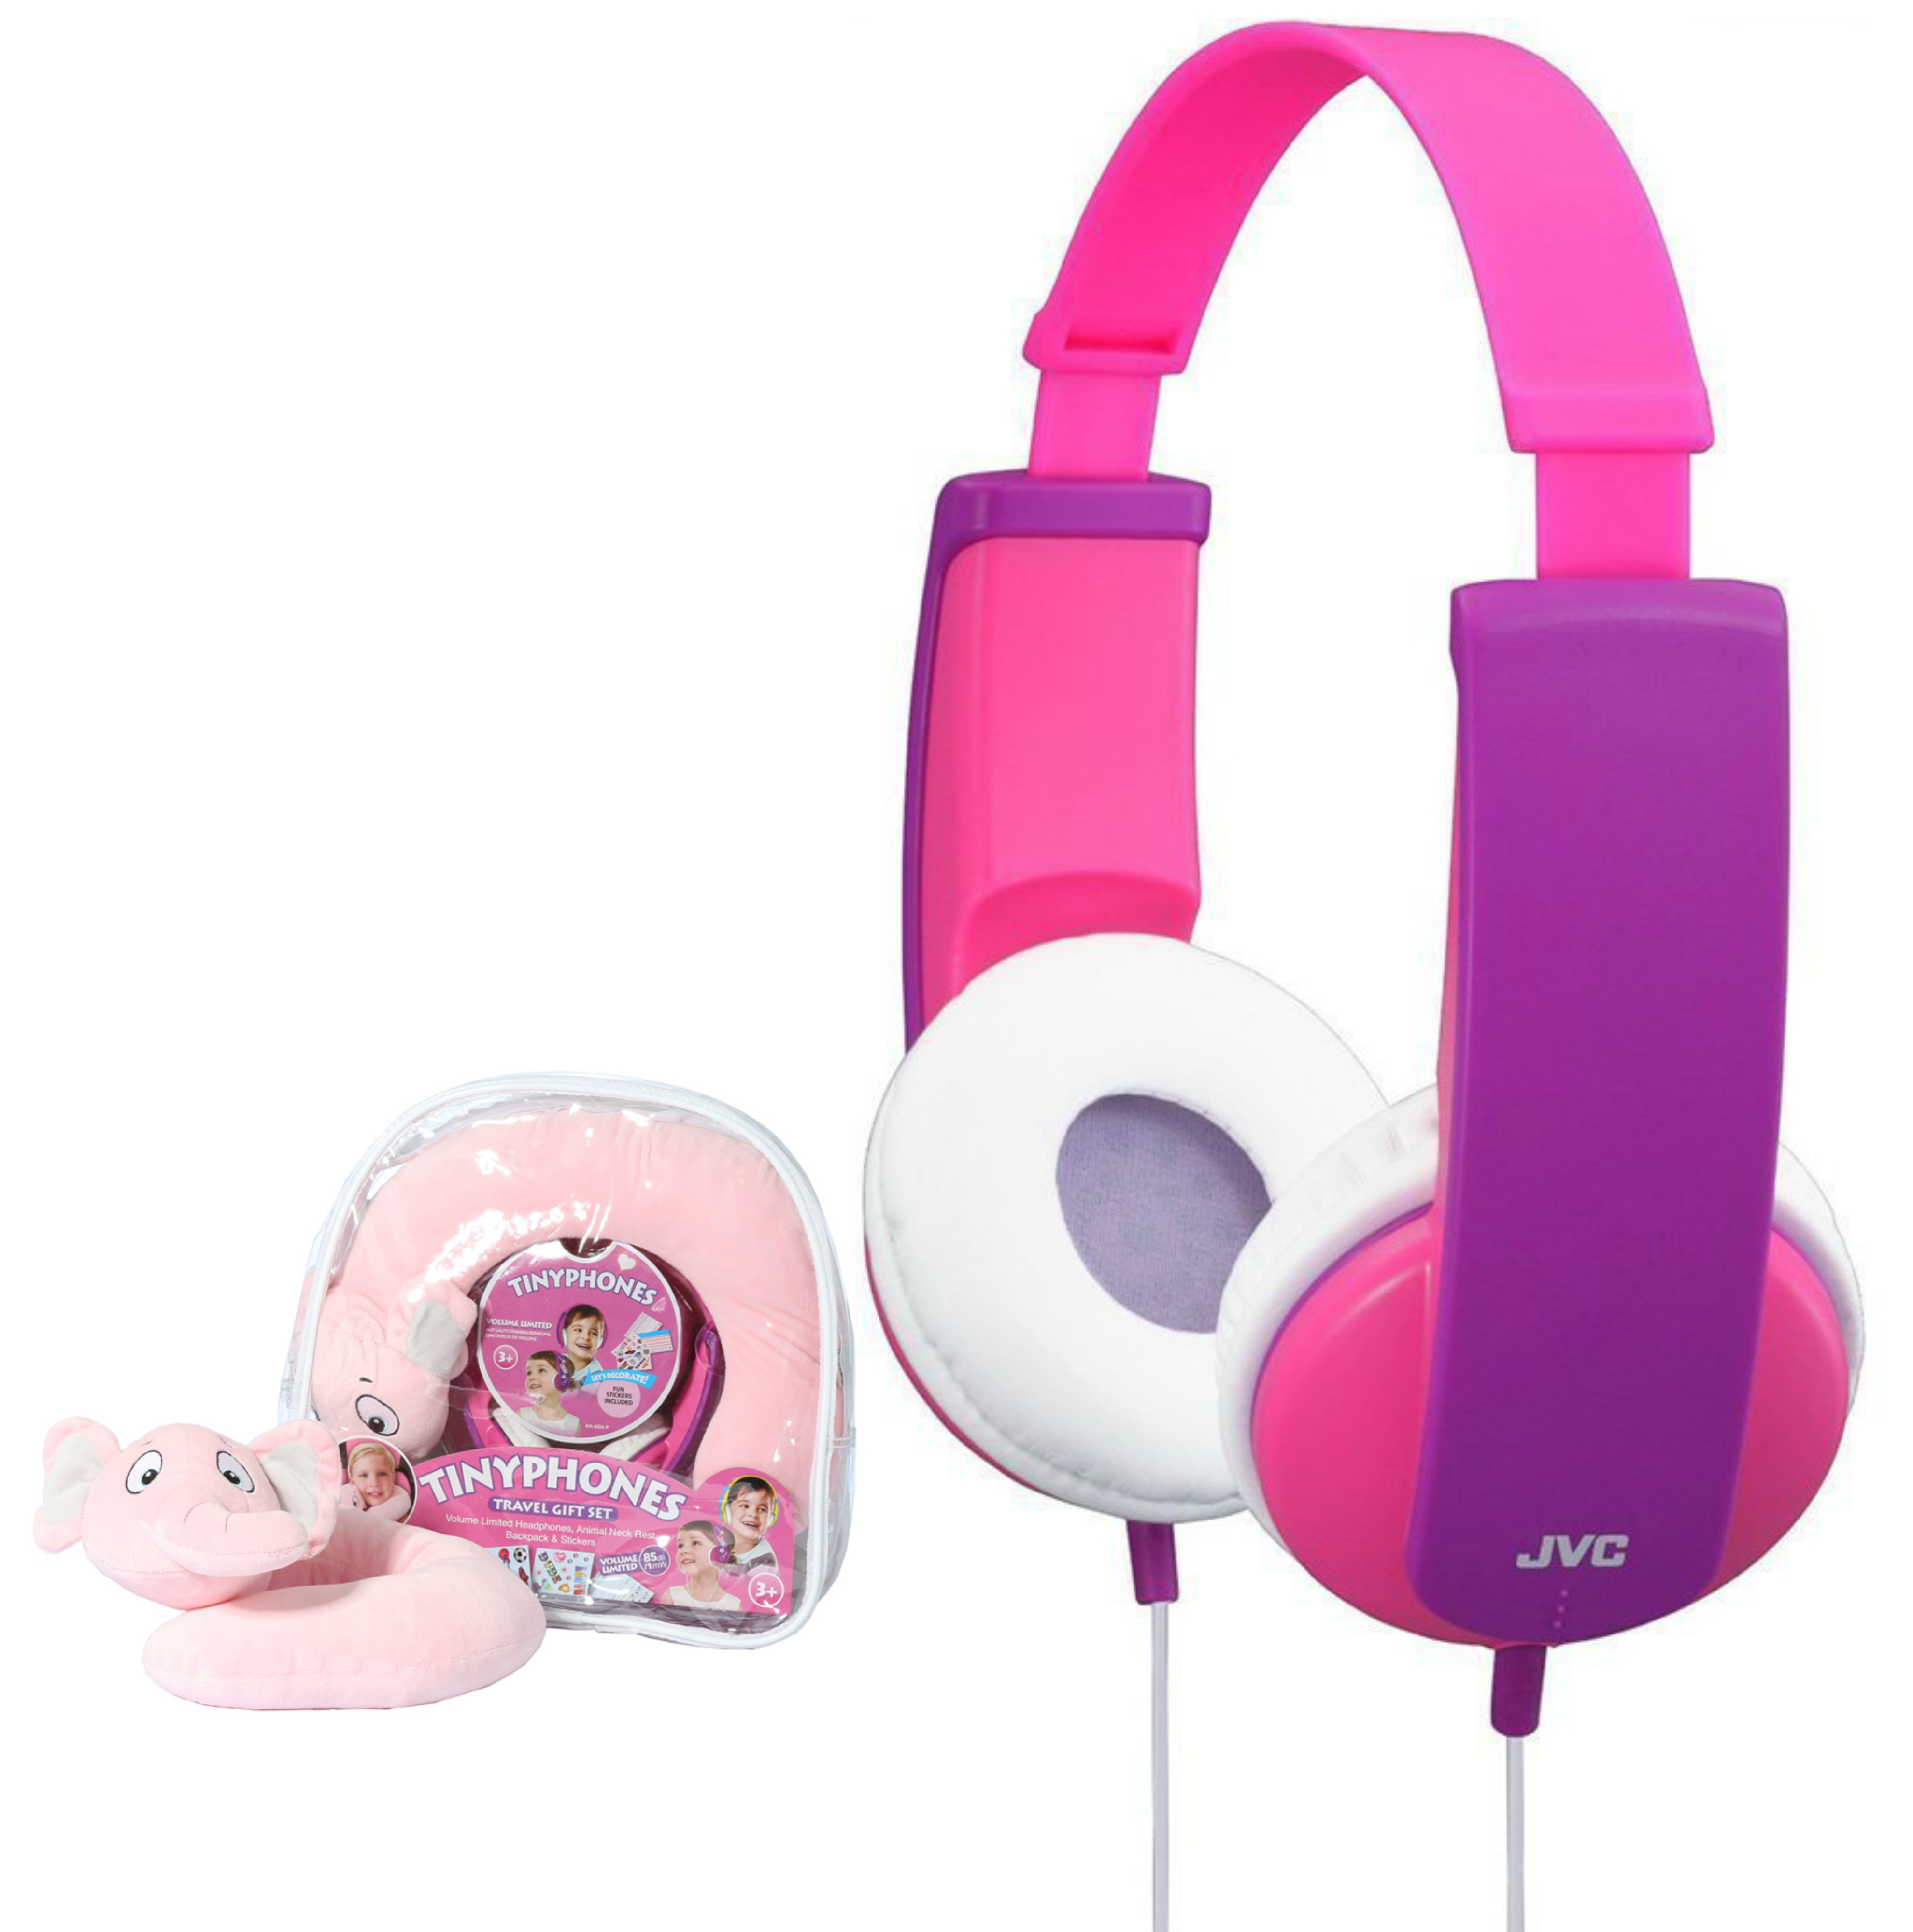 JVC HAKD5TRAV-P Tinyphone|Travel Gift Set|Headphone|Neck Pillow|Backpack|Sticker